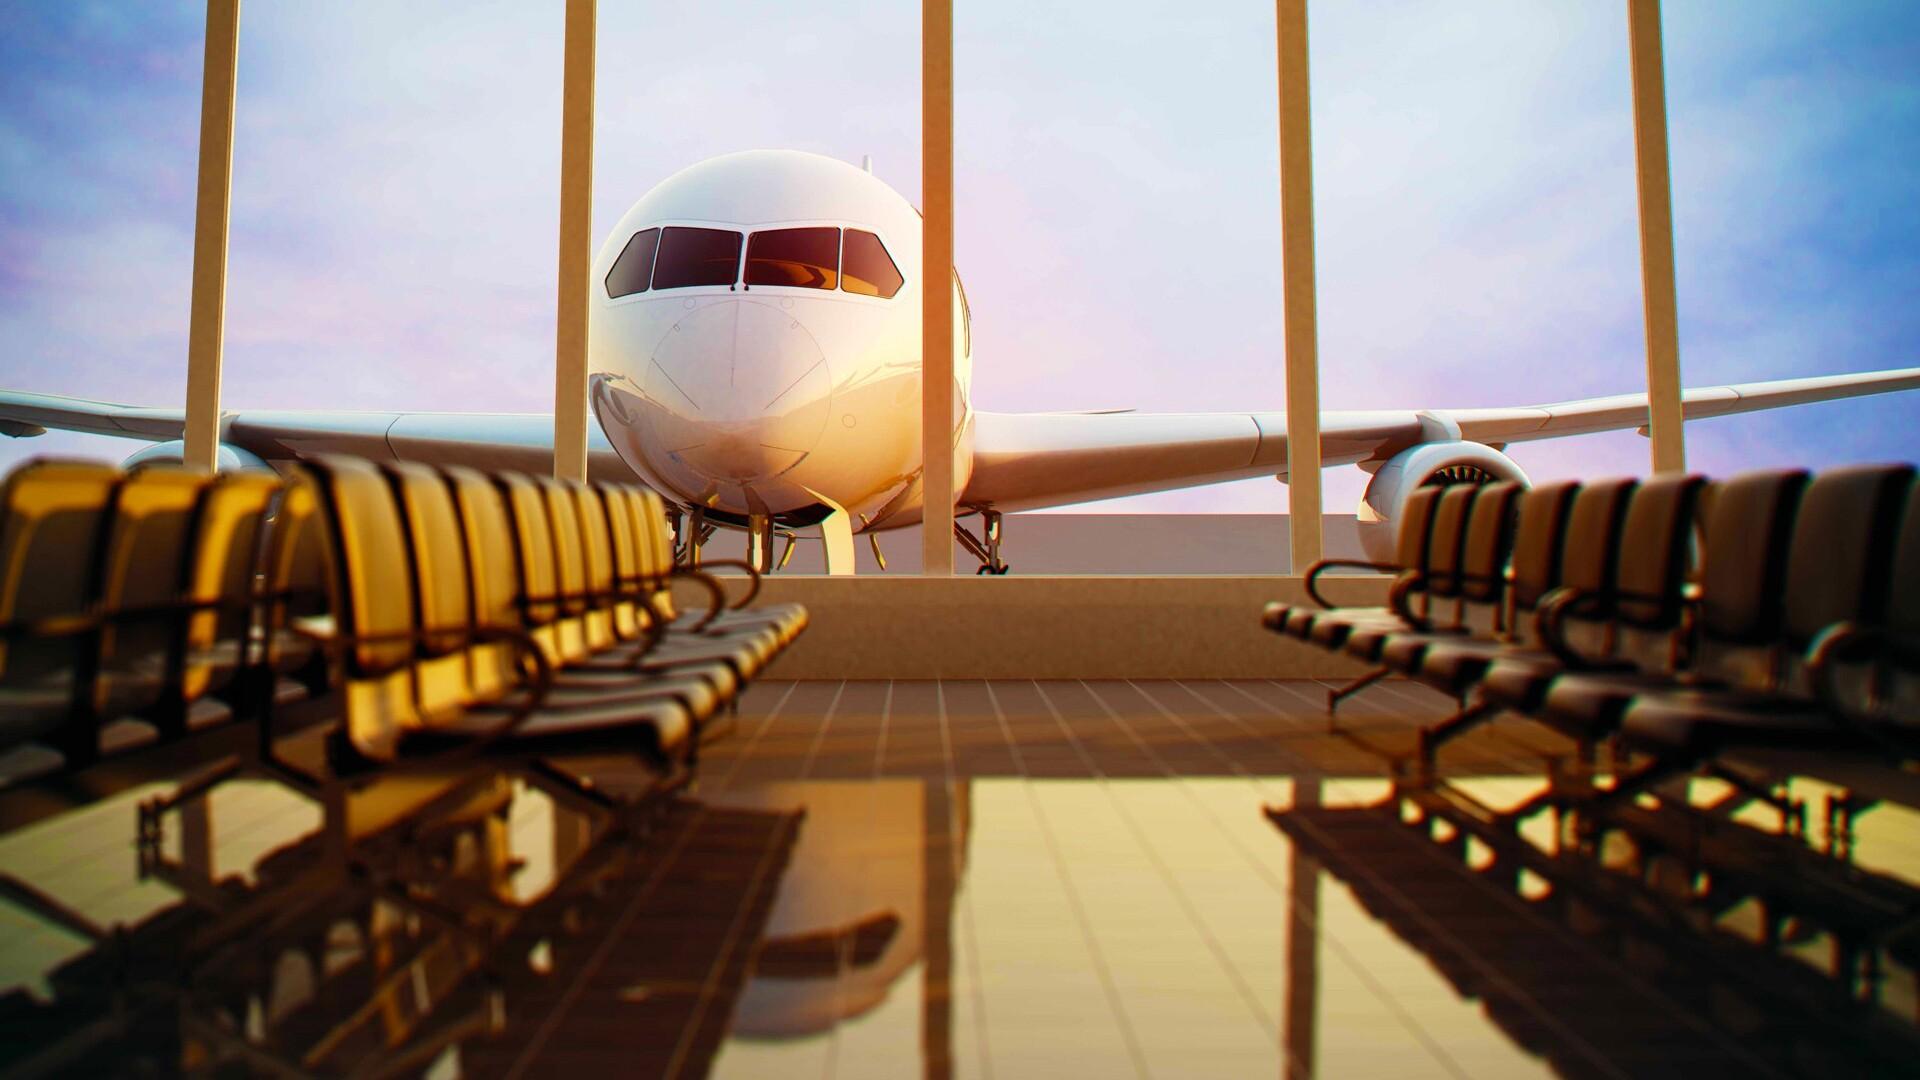 passenger-plane-qhd.jpg